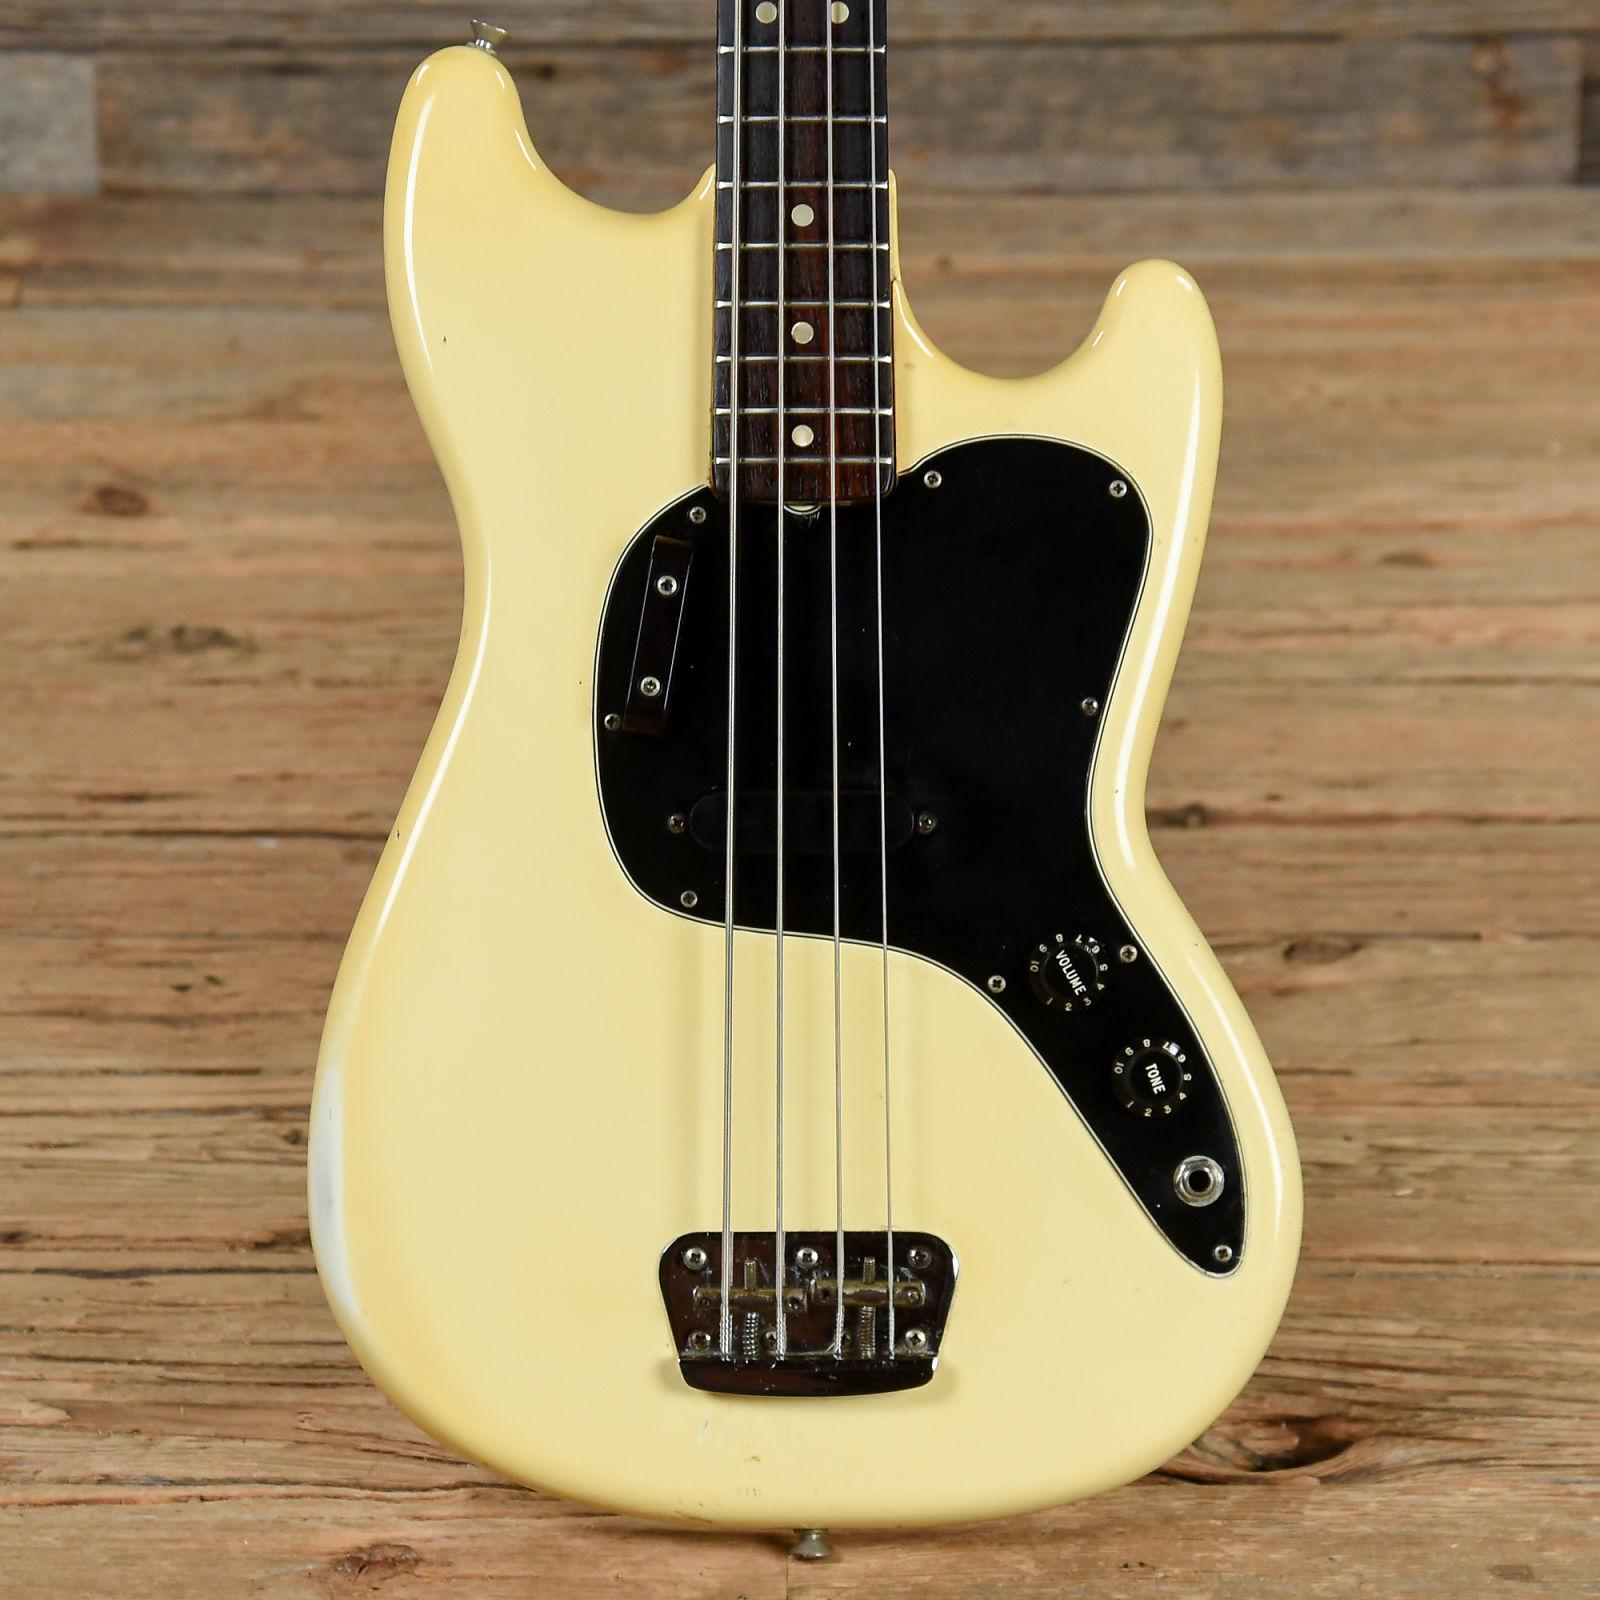 Fender musicmaster bass amp dating